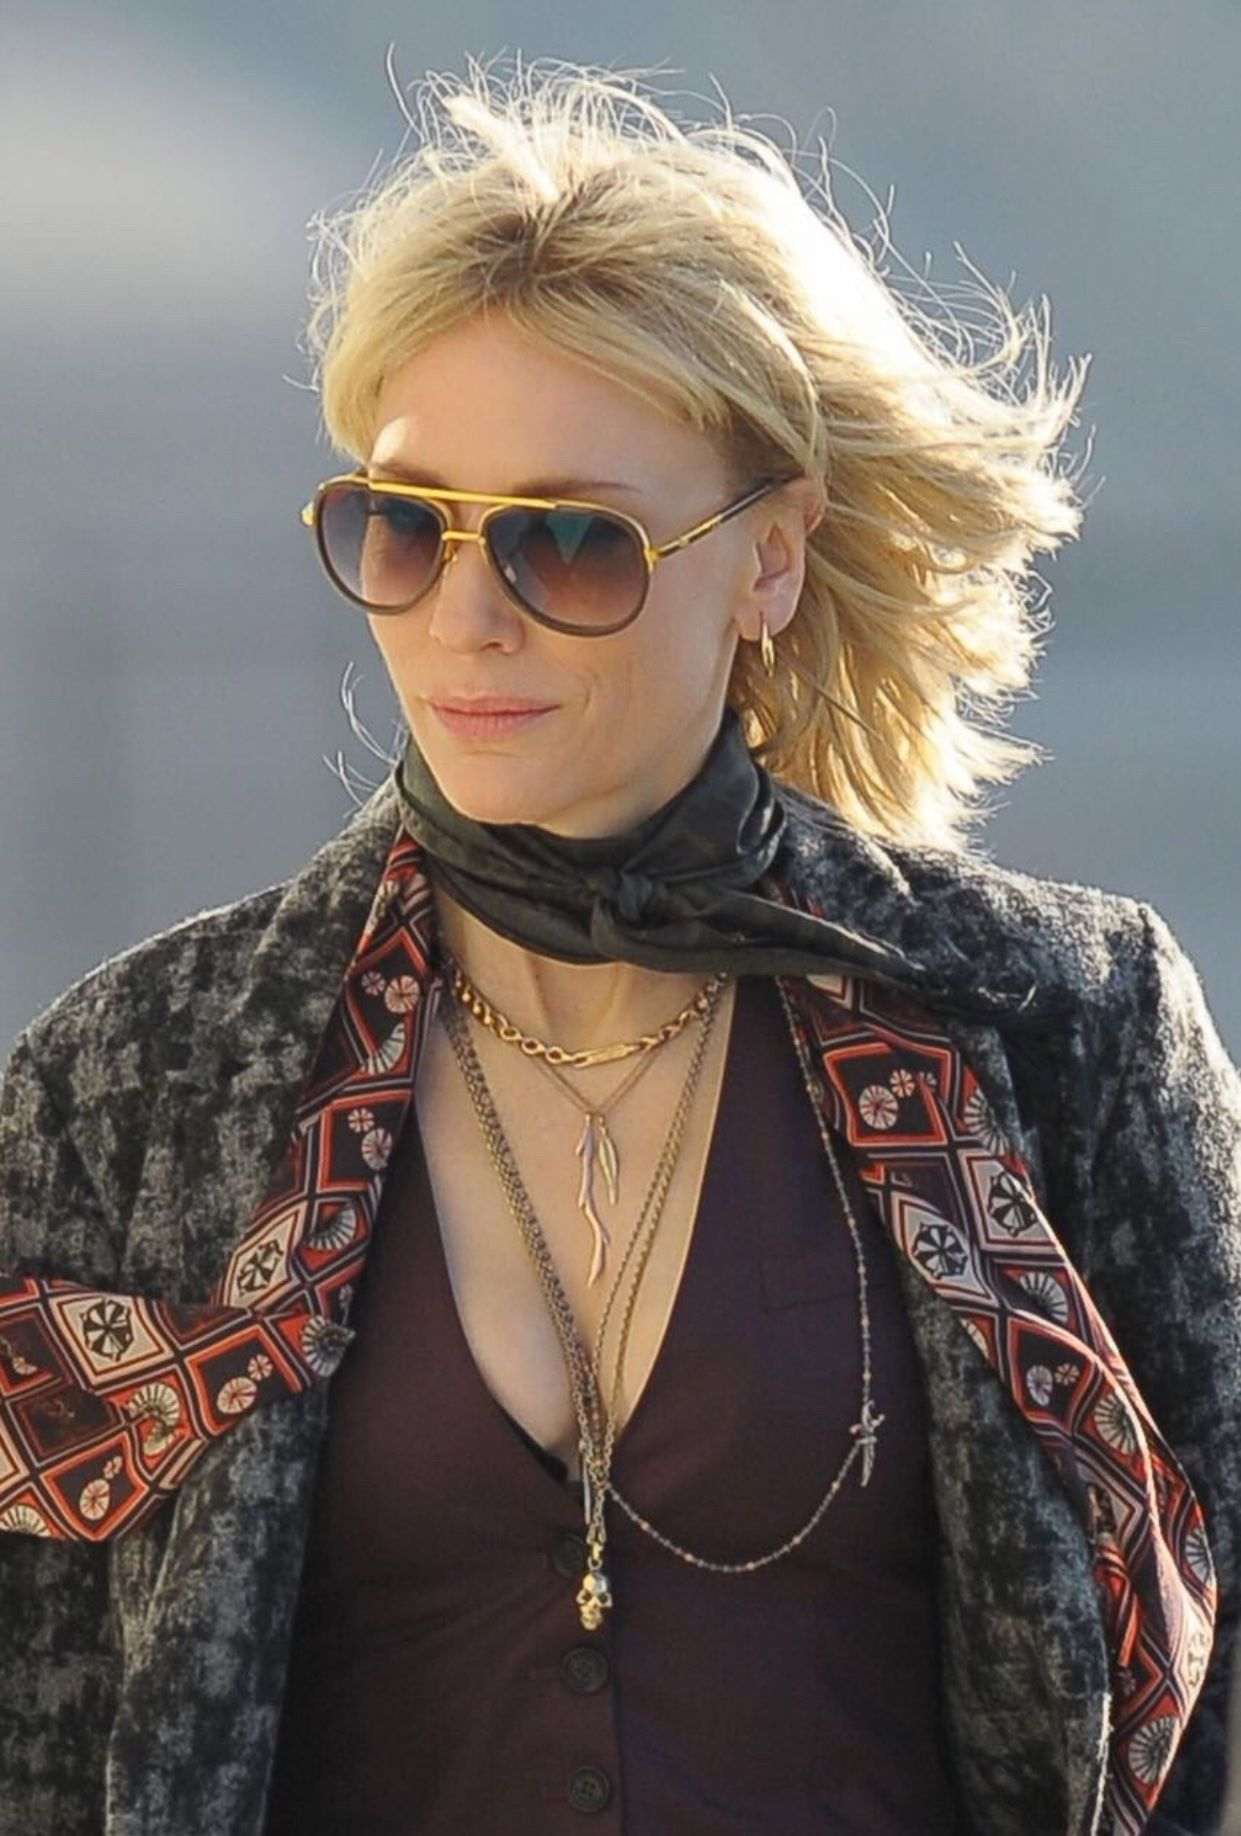 Cate Blanchett Cate Blanchett Films Cate Blanchett Celebrity